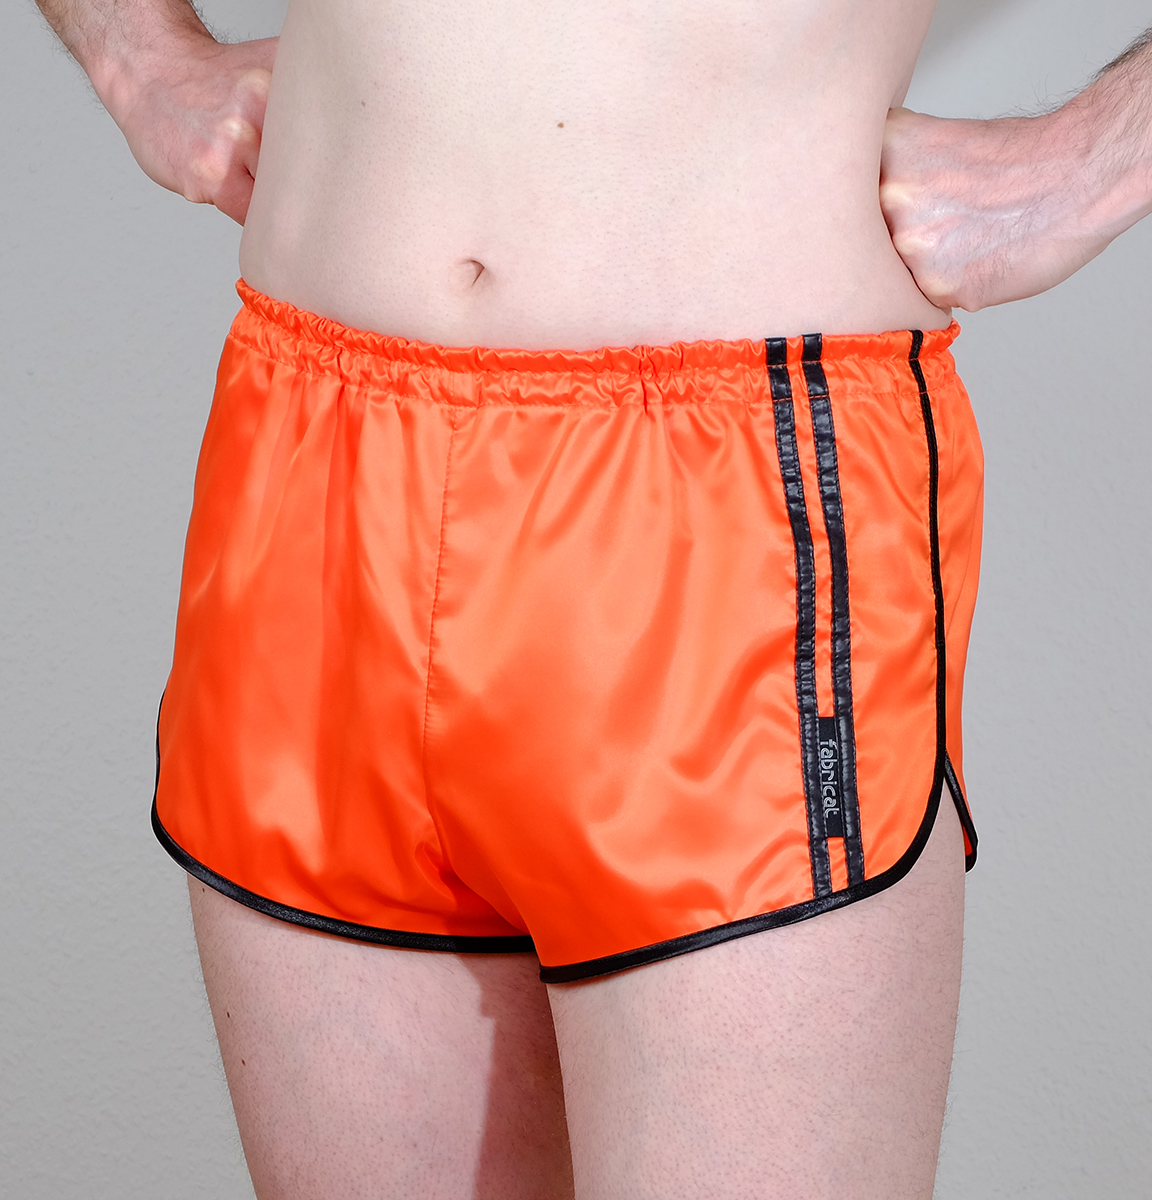 retro soft slick shiny satin nylon sprinter shorts for. Black Bedroom Furniture Sets. Home Design Ideas